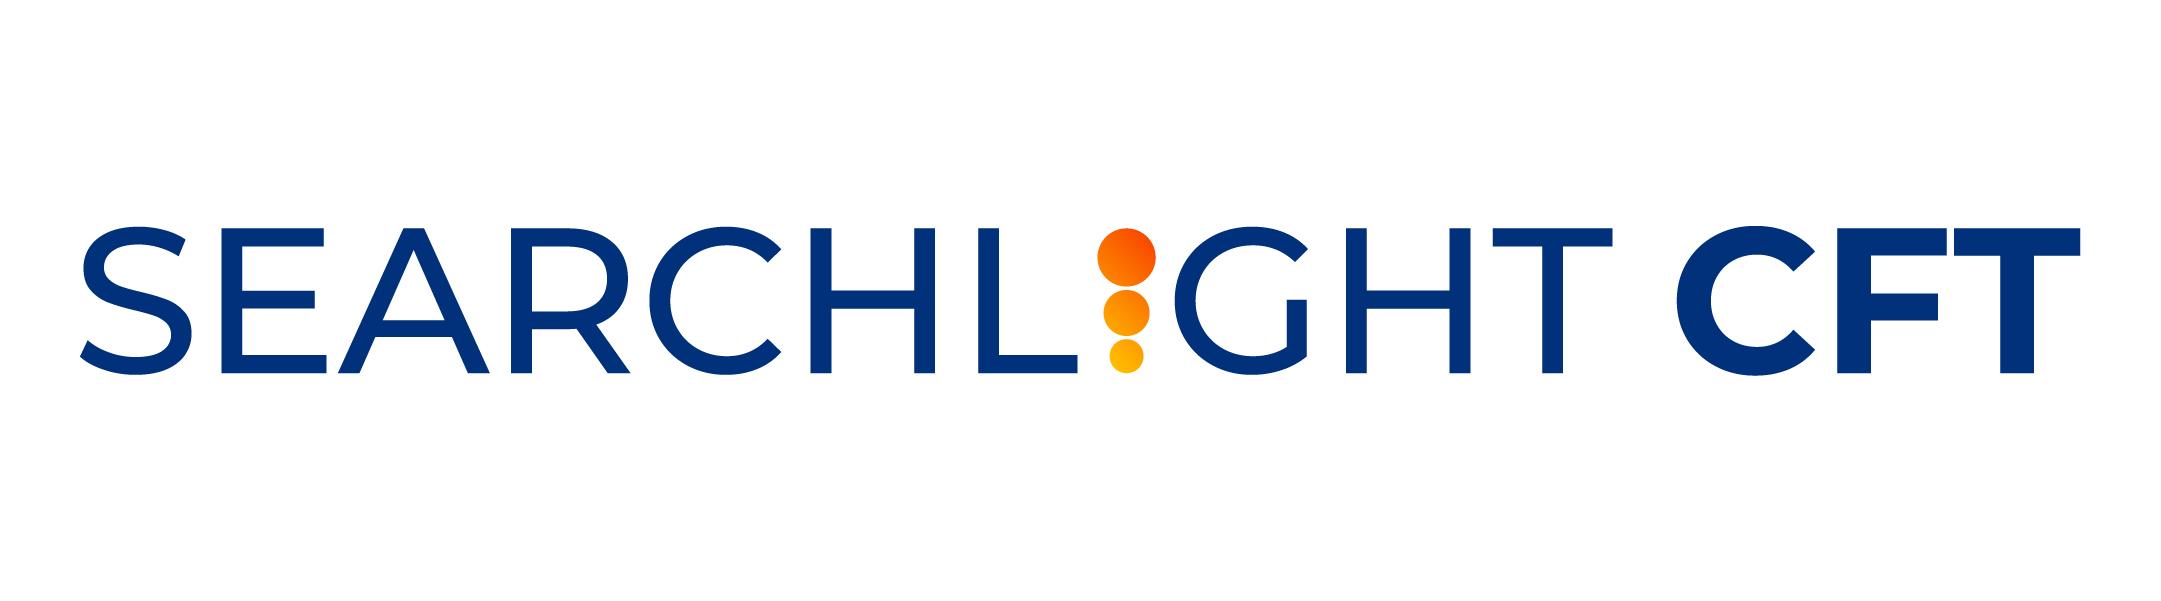 Searchlight-01.jpg